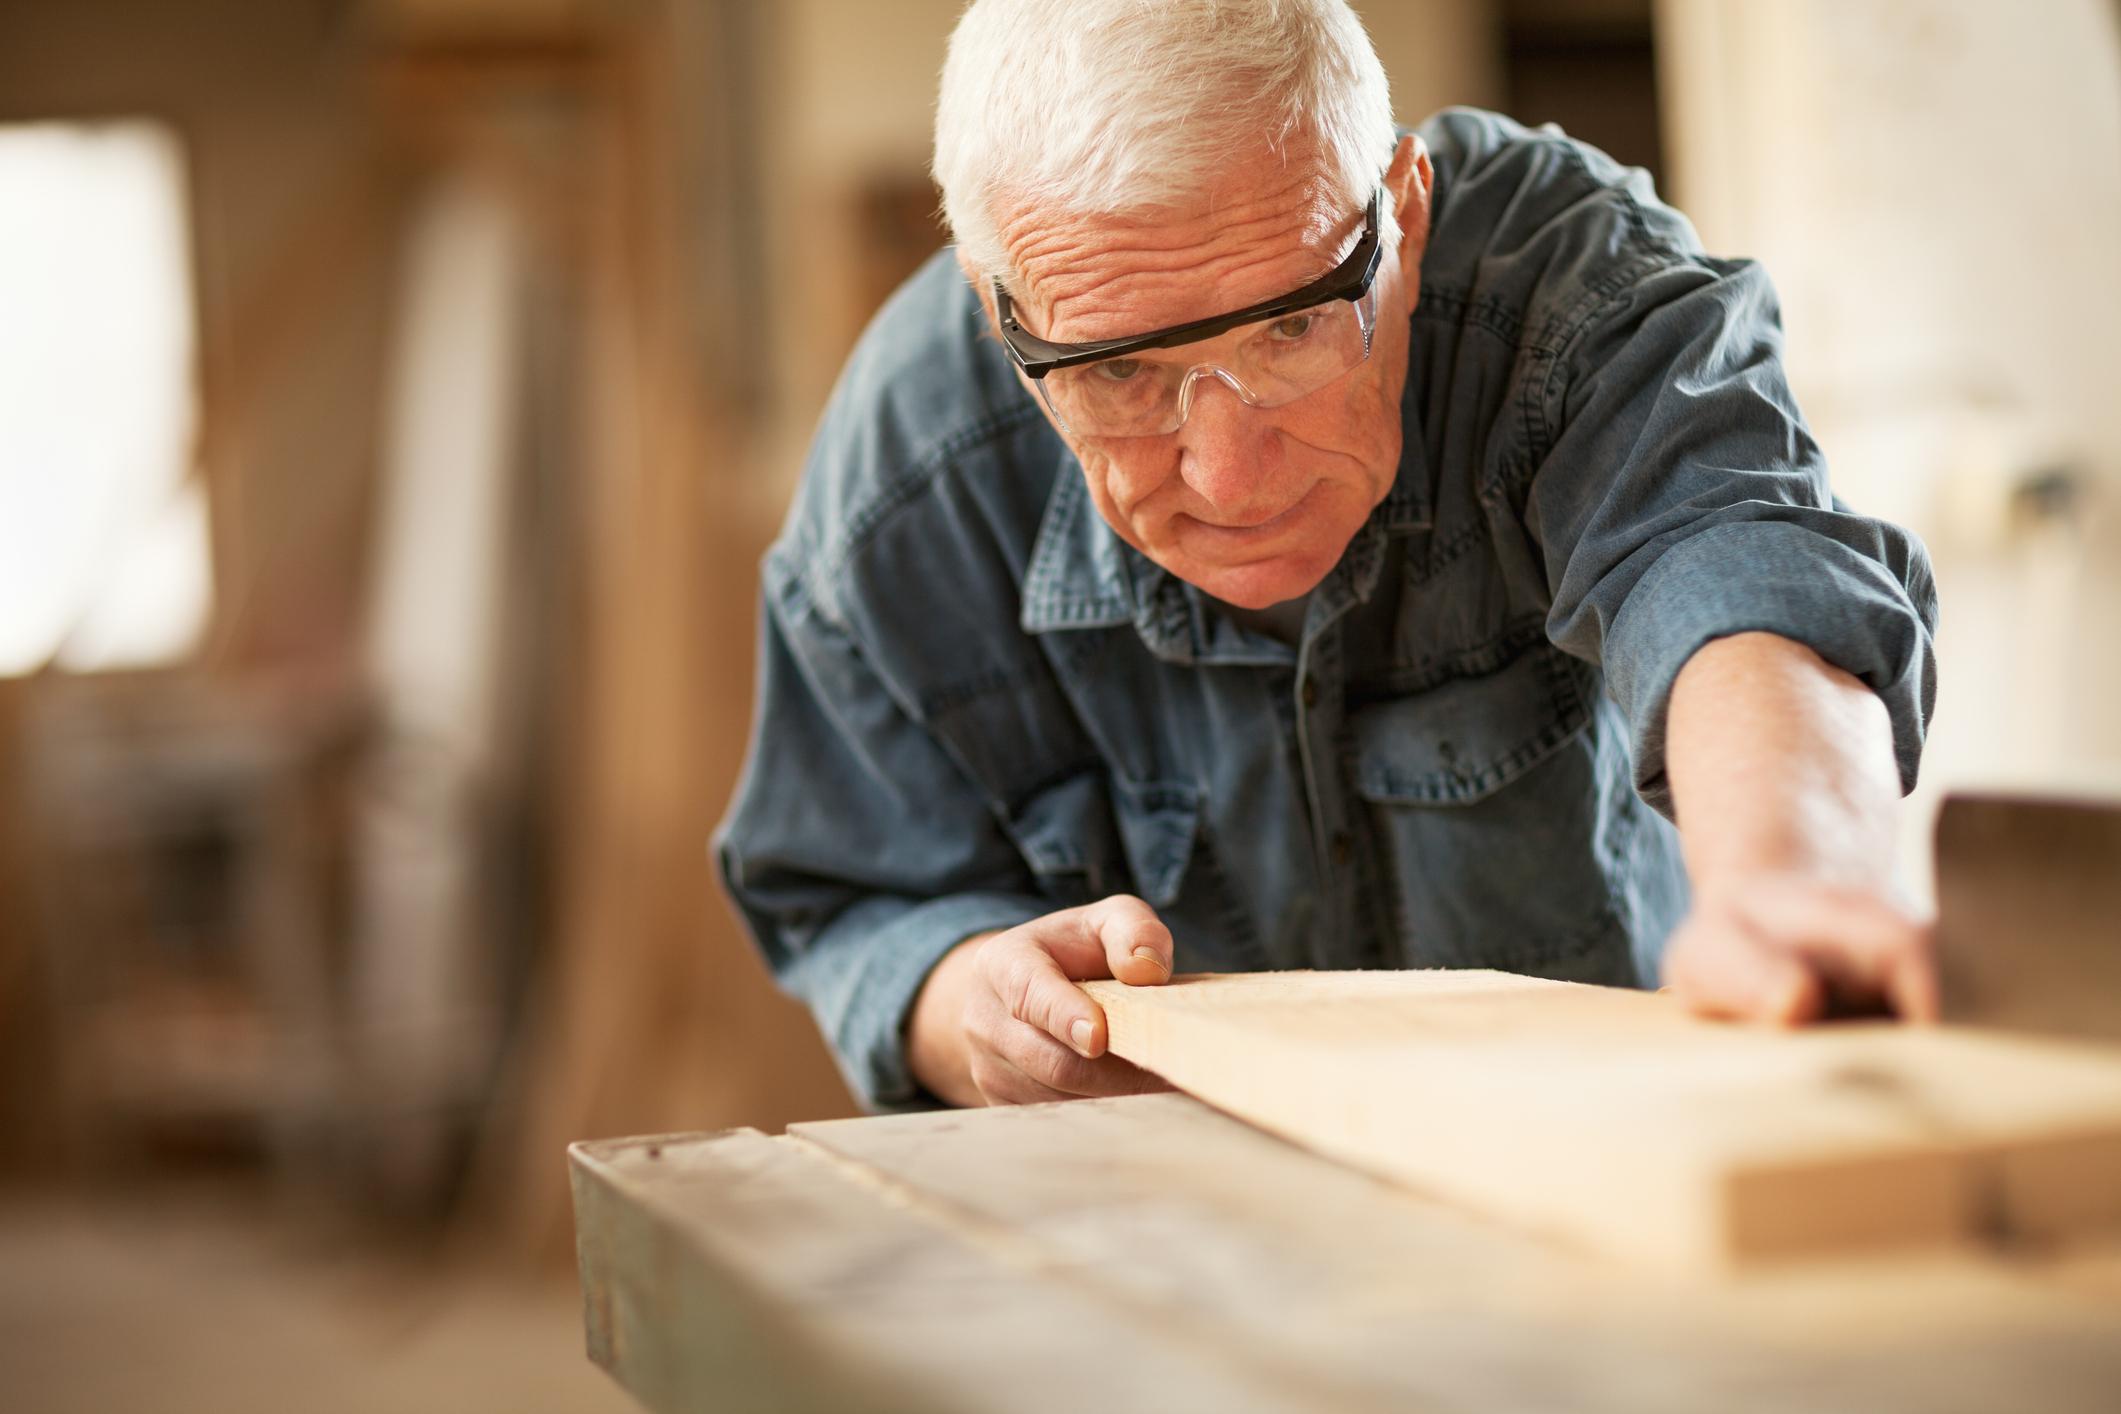 An senior man measuring a piece of lumber.